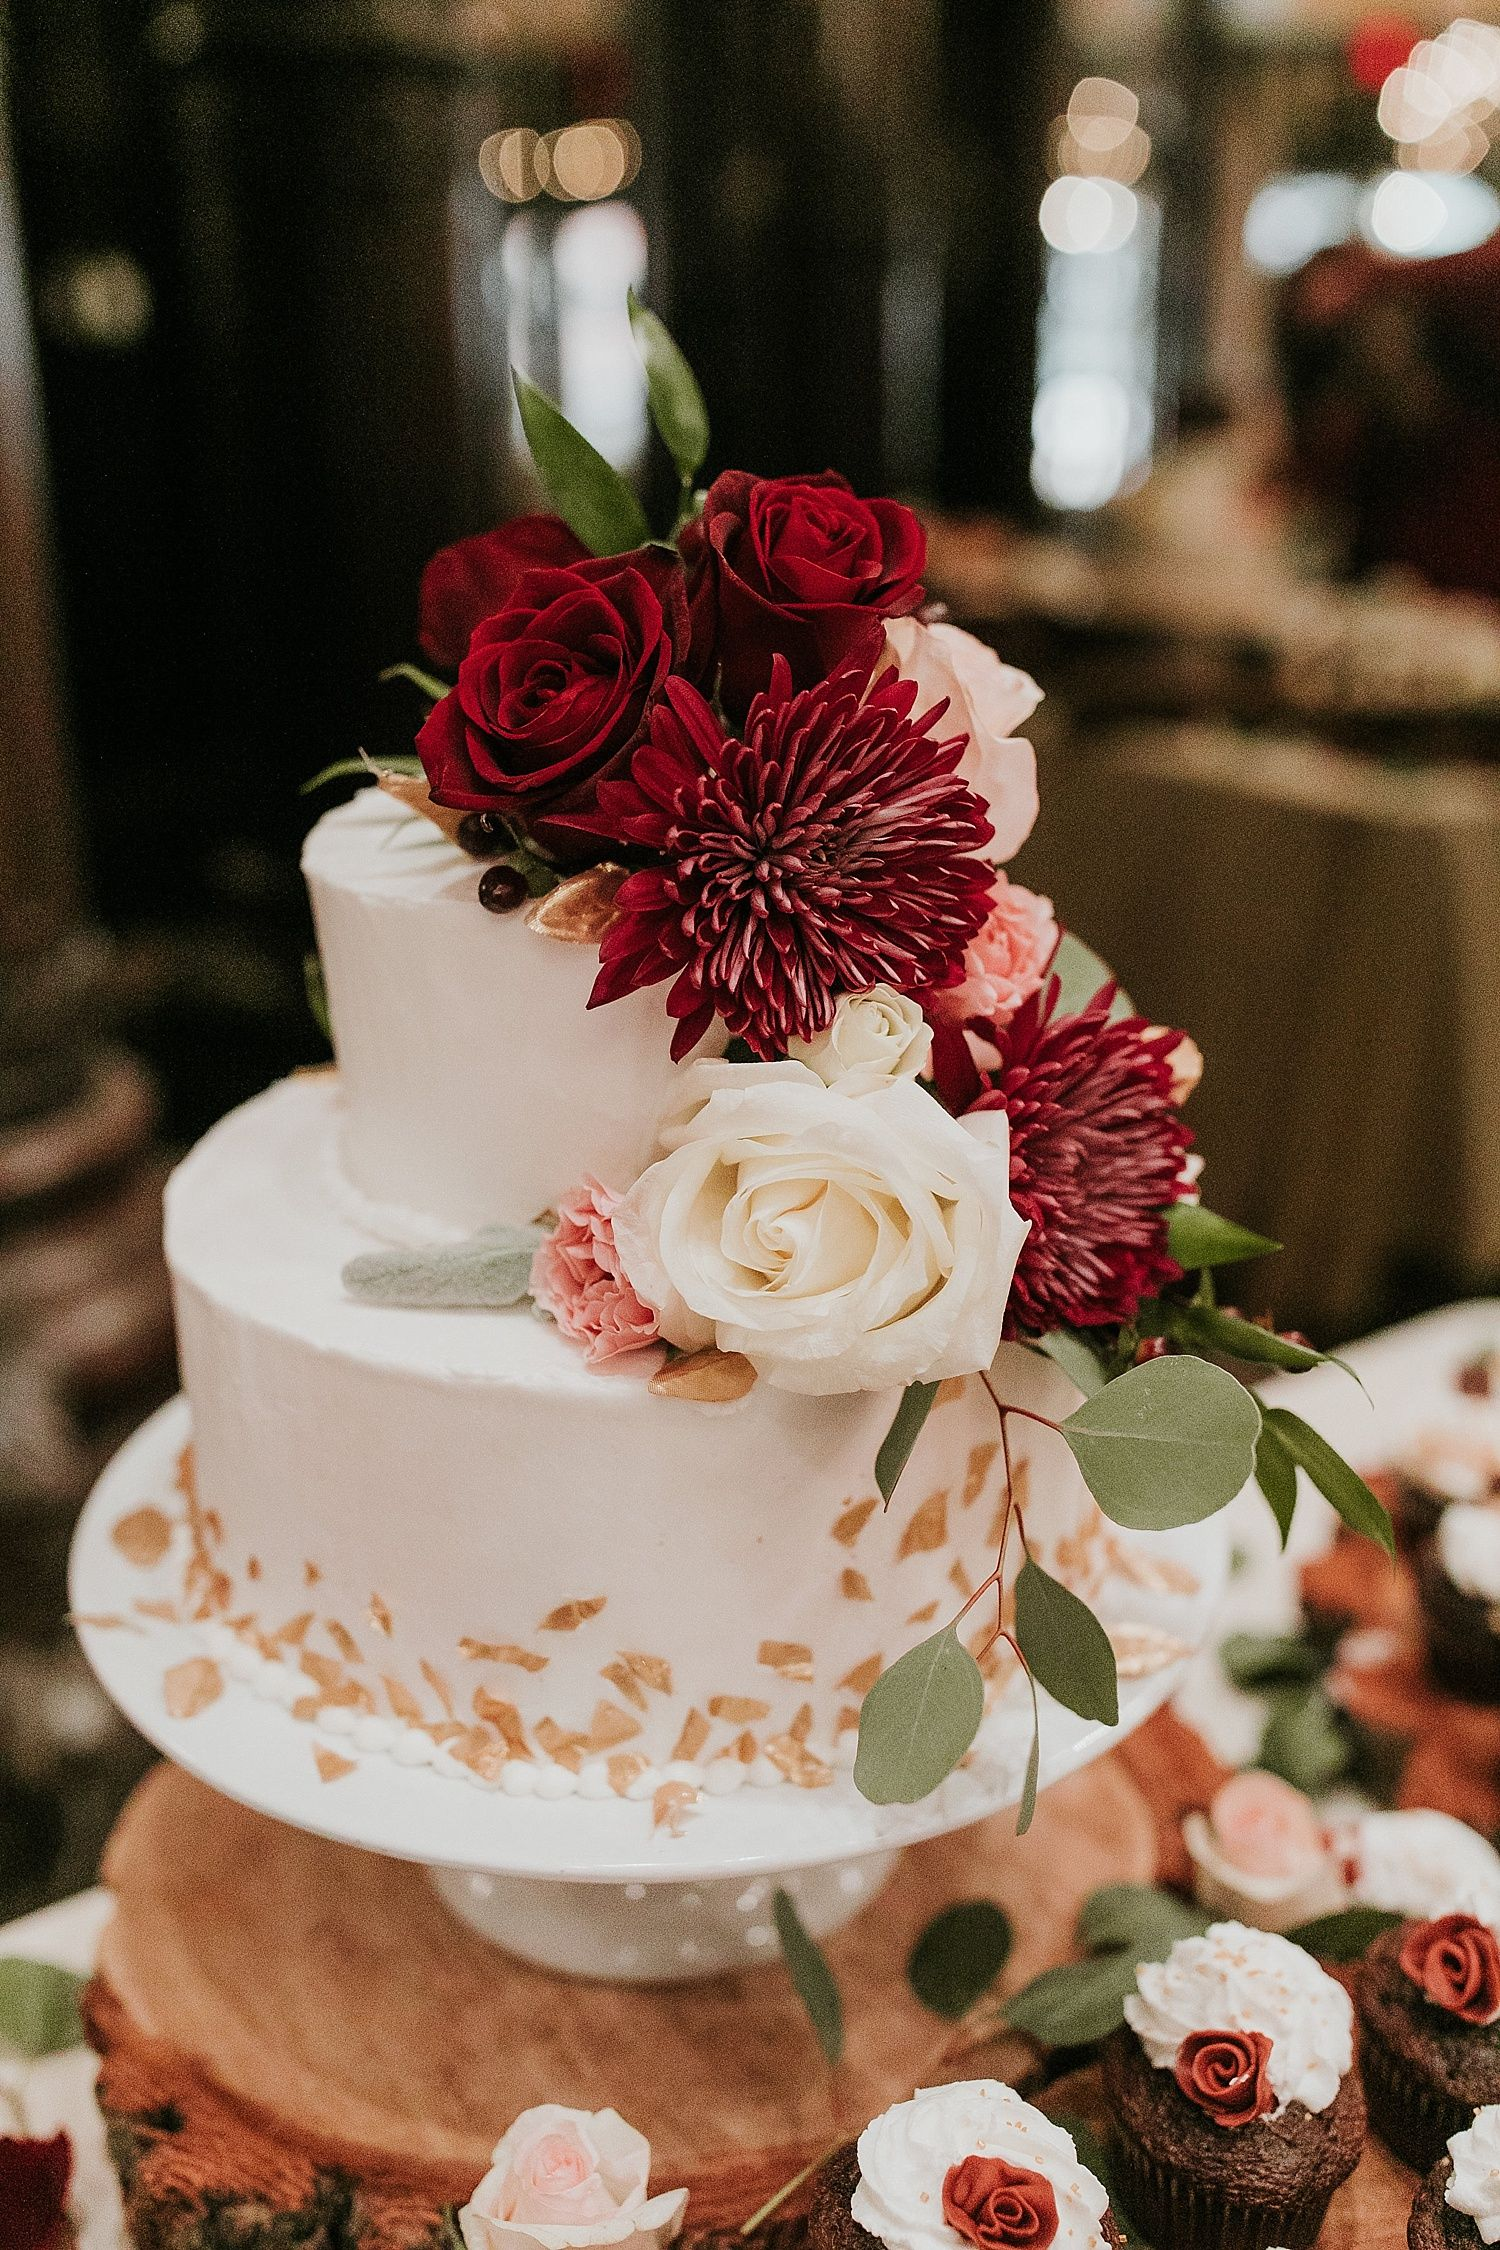 Dreamy wedding cakes weddings pinterest wedding wedding